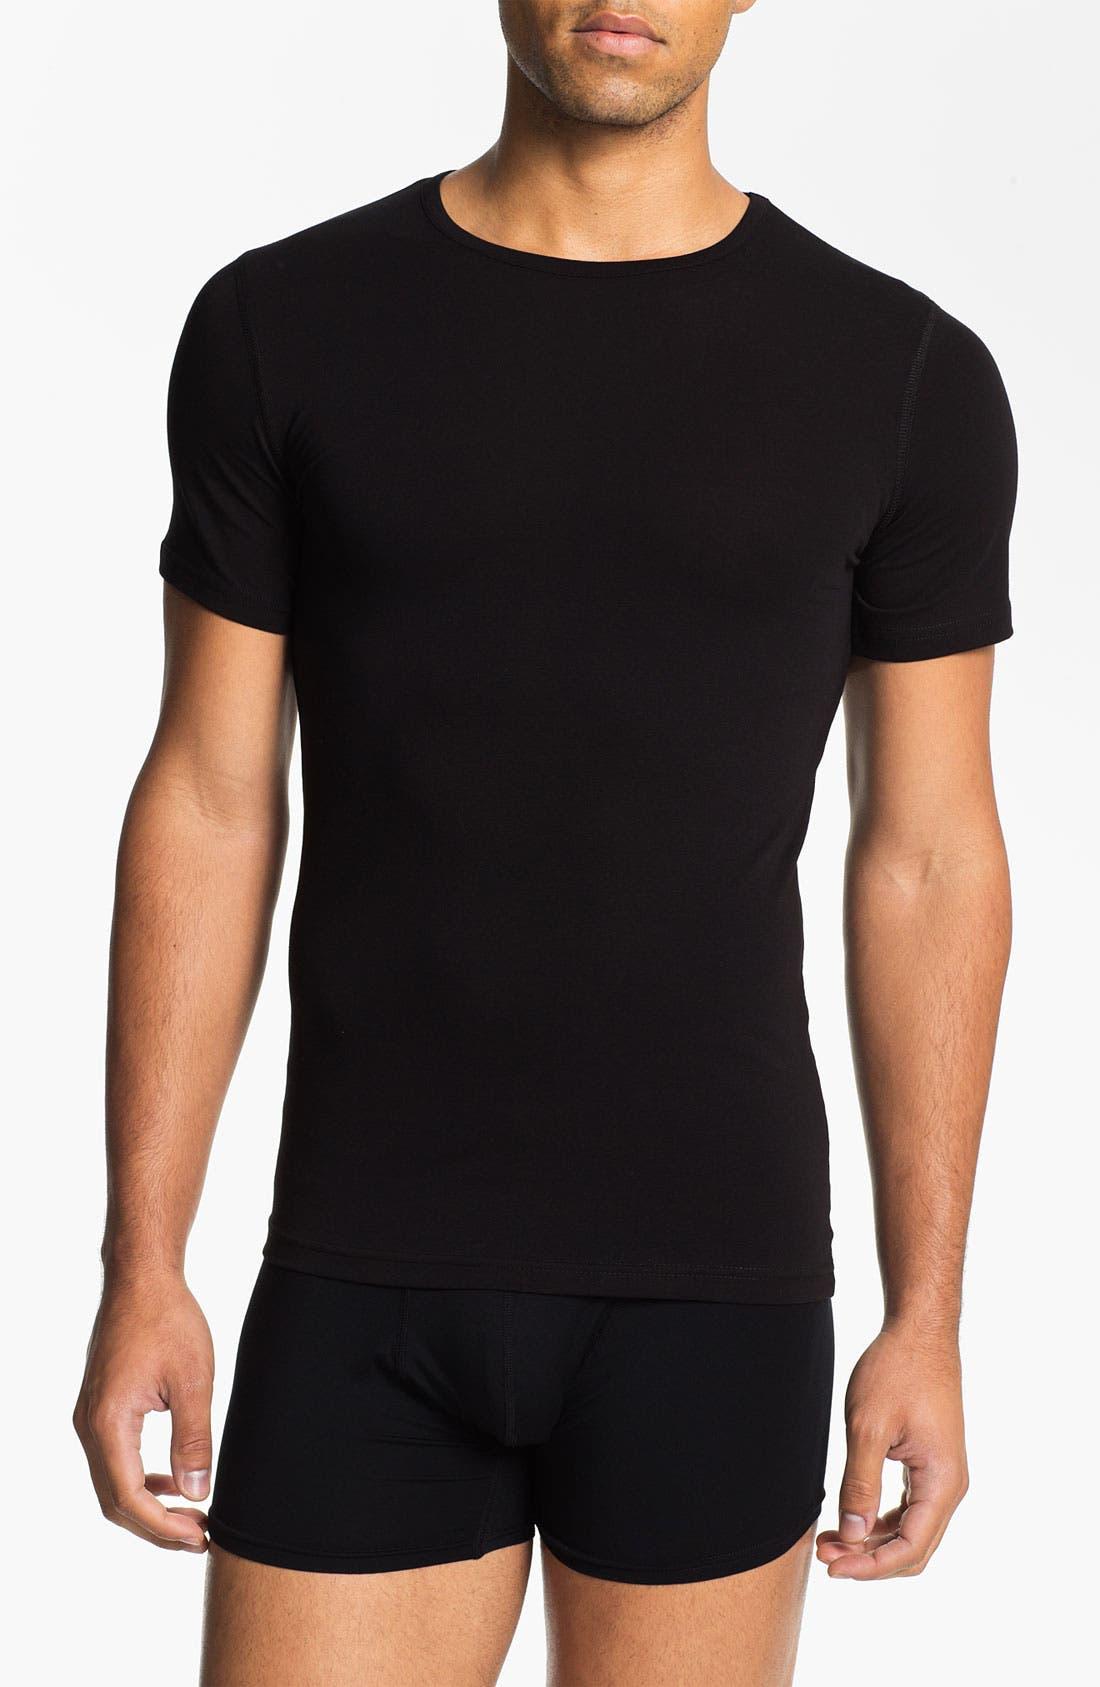 Alternate Image 1 Selected - Naked Crewneck Cotton Undershirt